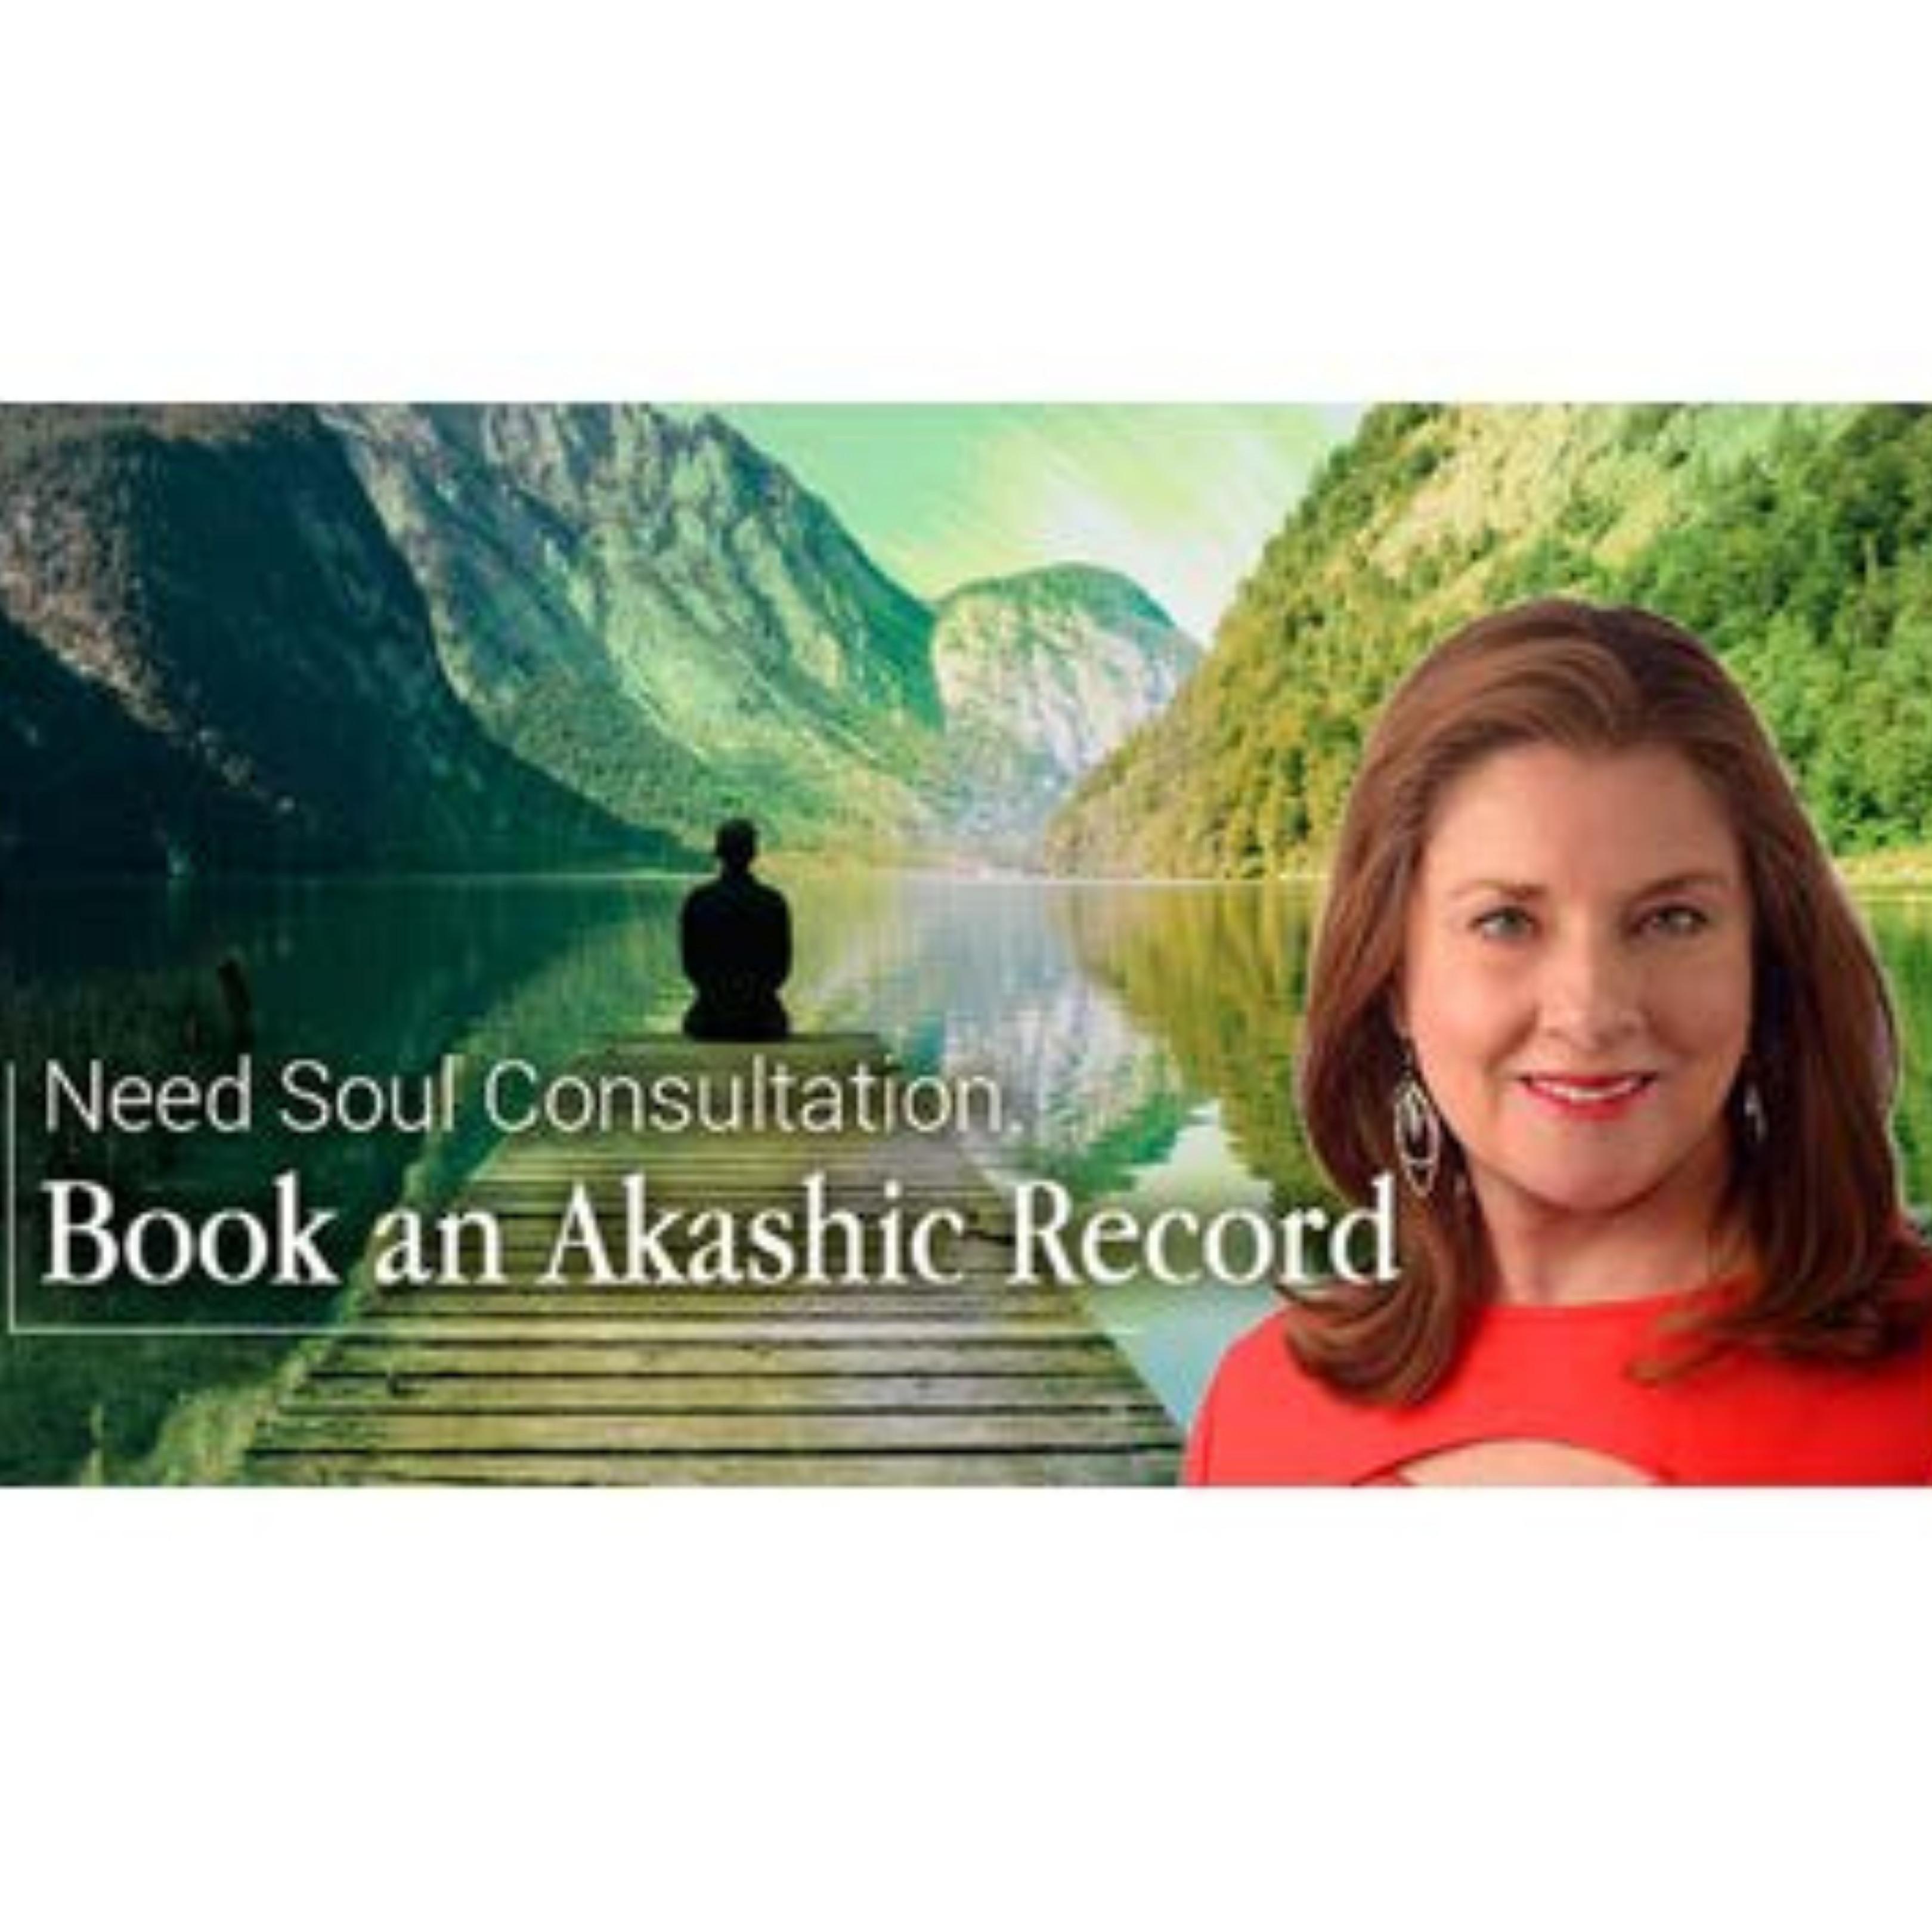 Akashic Record Consultation - 30 minutes